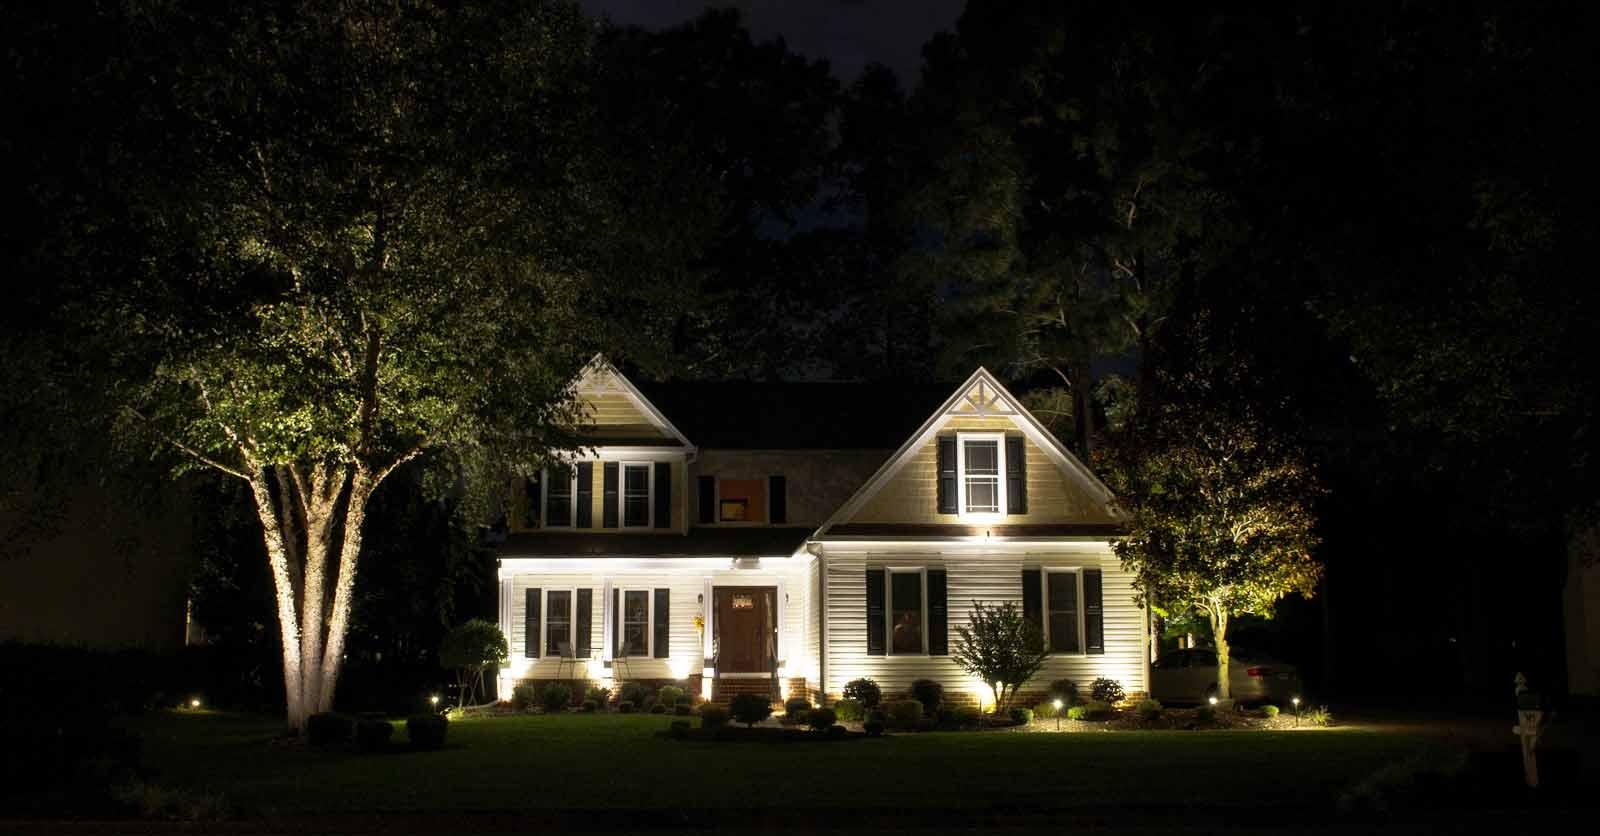 james city county yard lighting